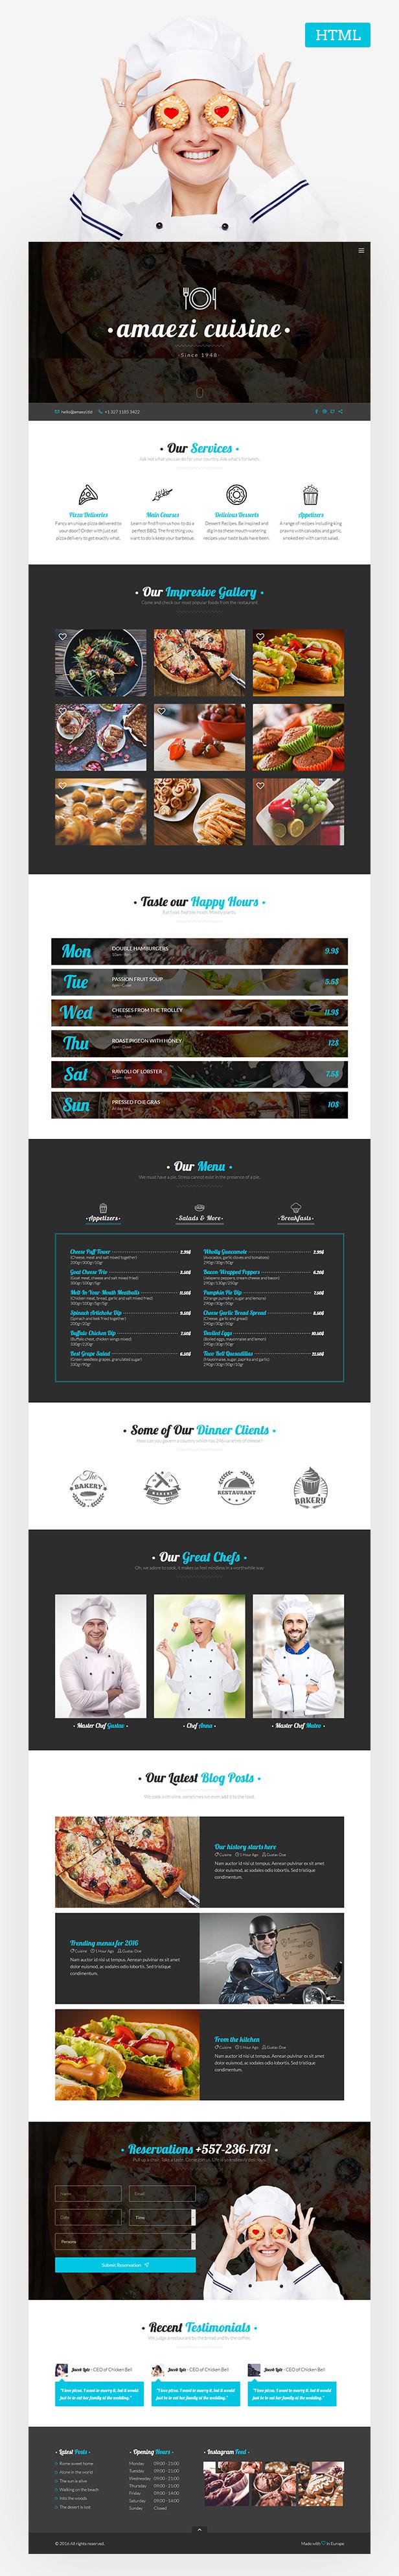 Amaezi - Responsive Restaurant HTML Template by ThemeSLR   ThemeForest